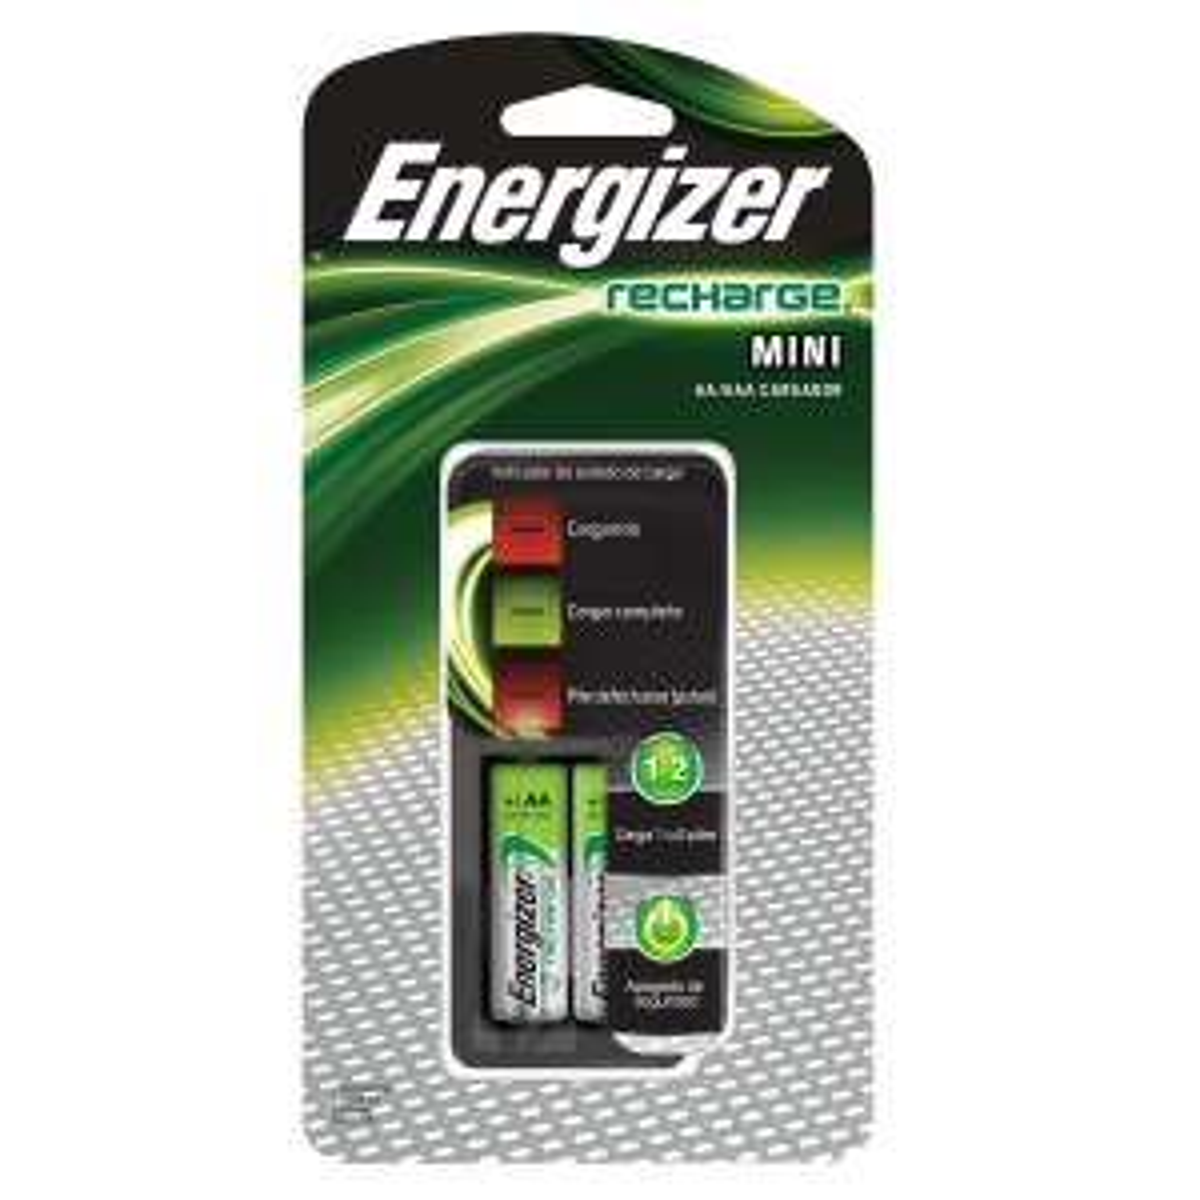 Sanborns Cargador Energizer + 2 Pilas recargables AA